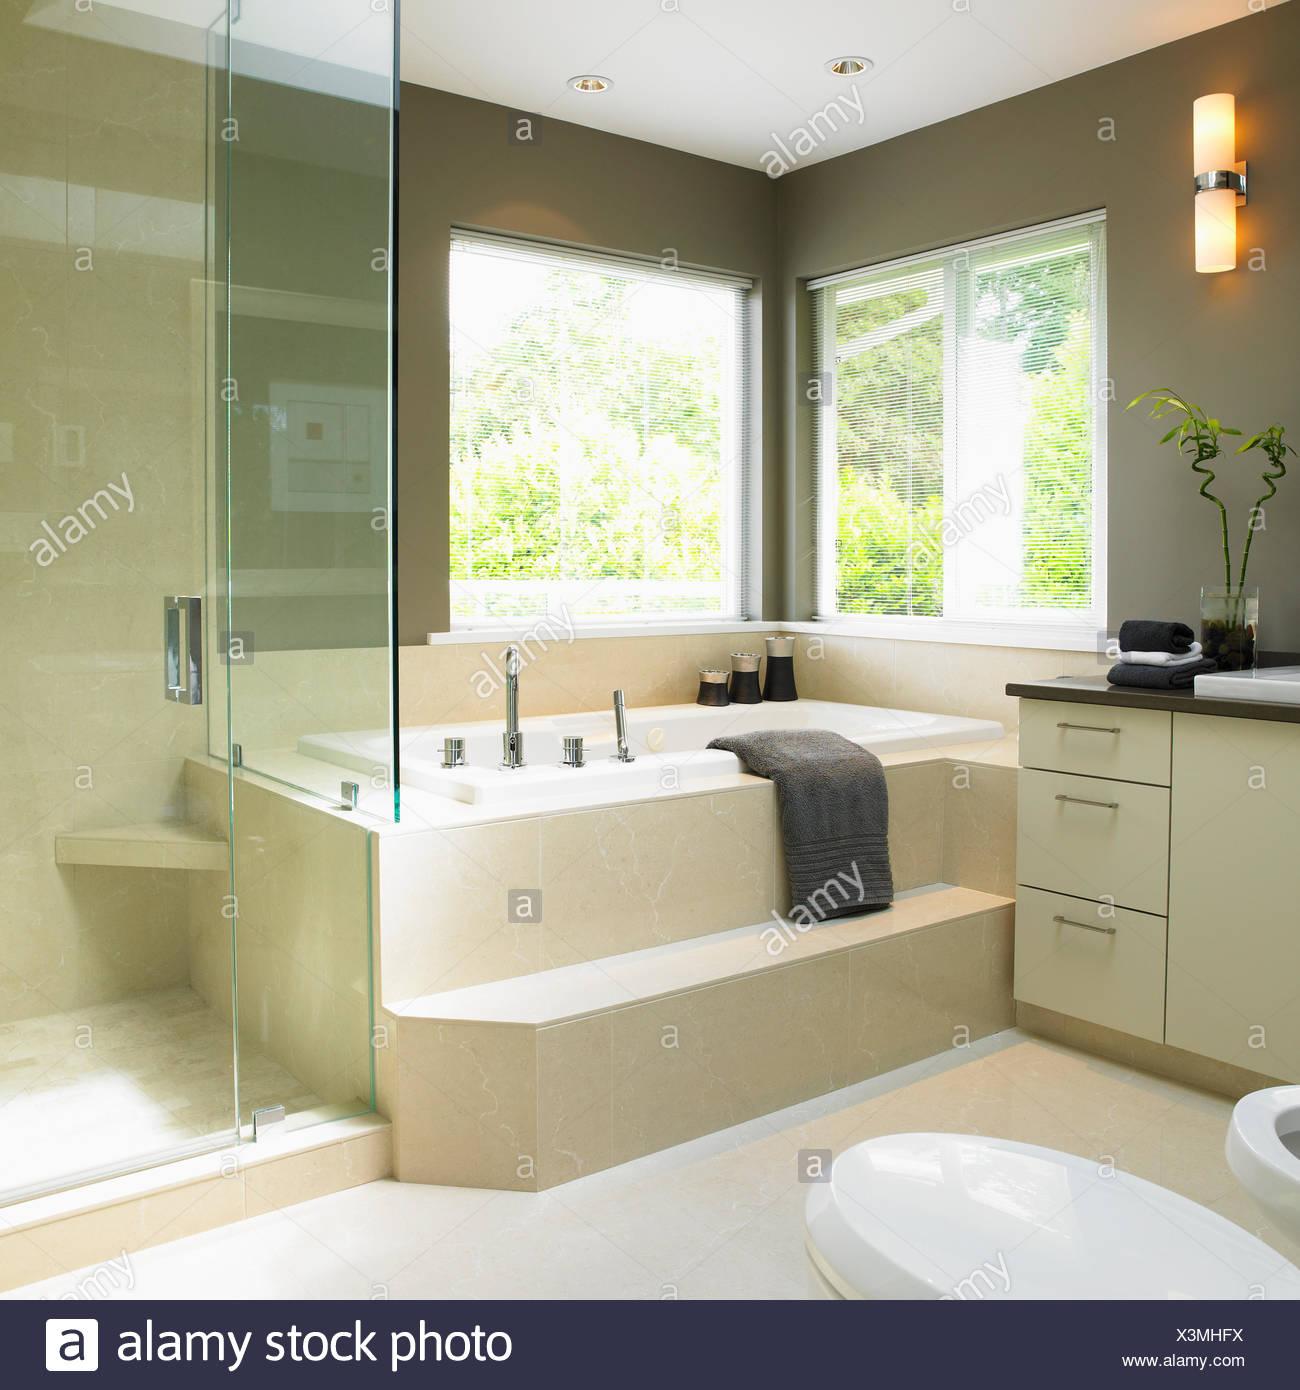 Soaker Tub Stock Photos & Soaker Tub Stock Images - Alamy